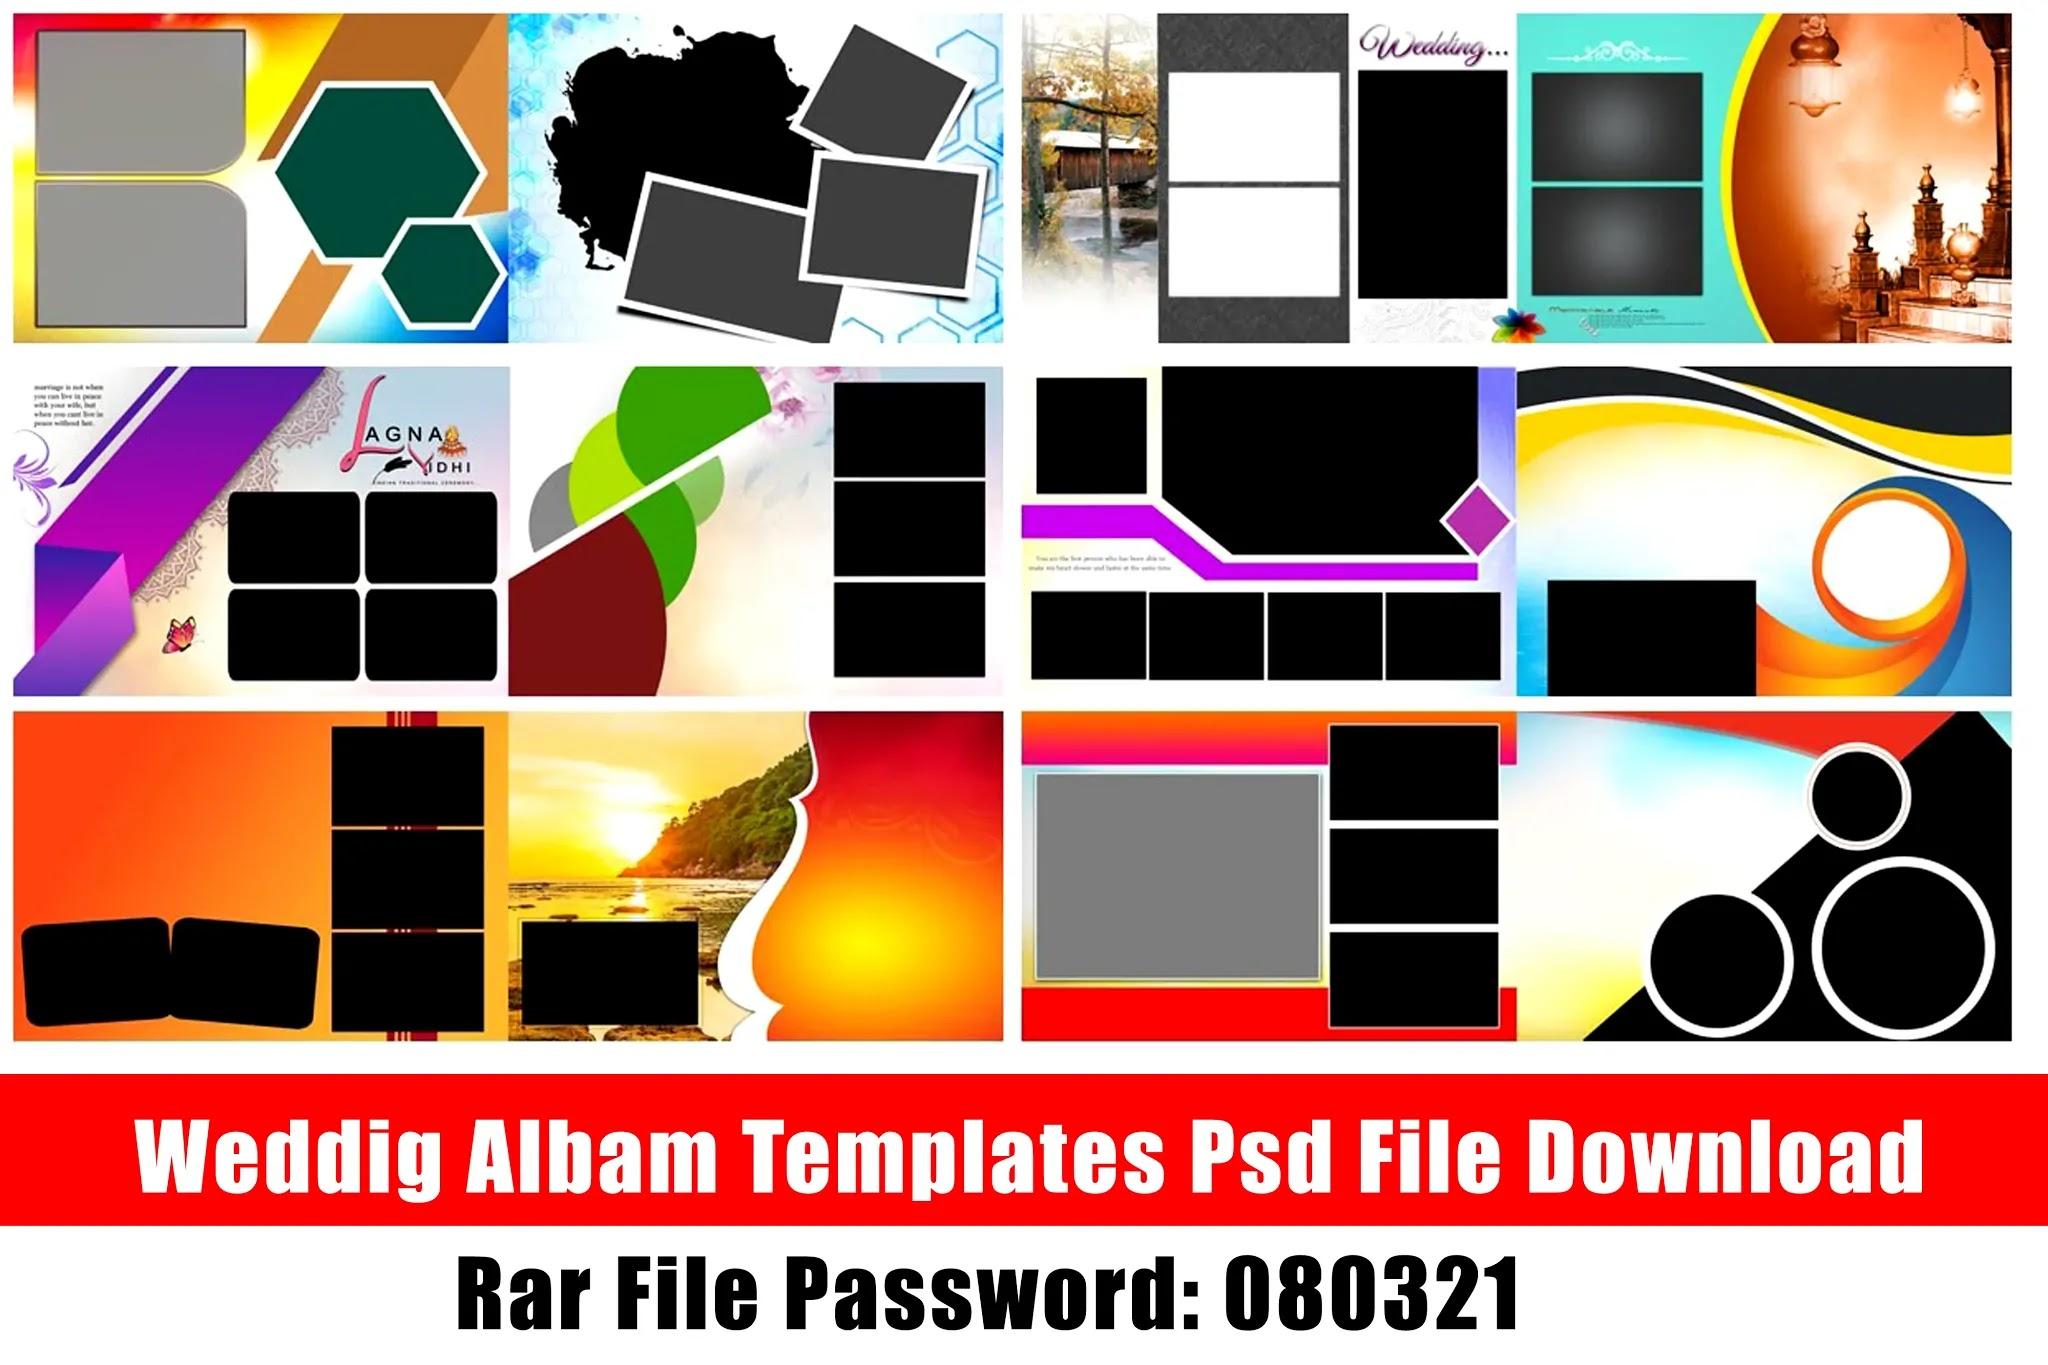 Wedding Albam Templates Psd File Free Download Kumaran Network